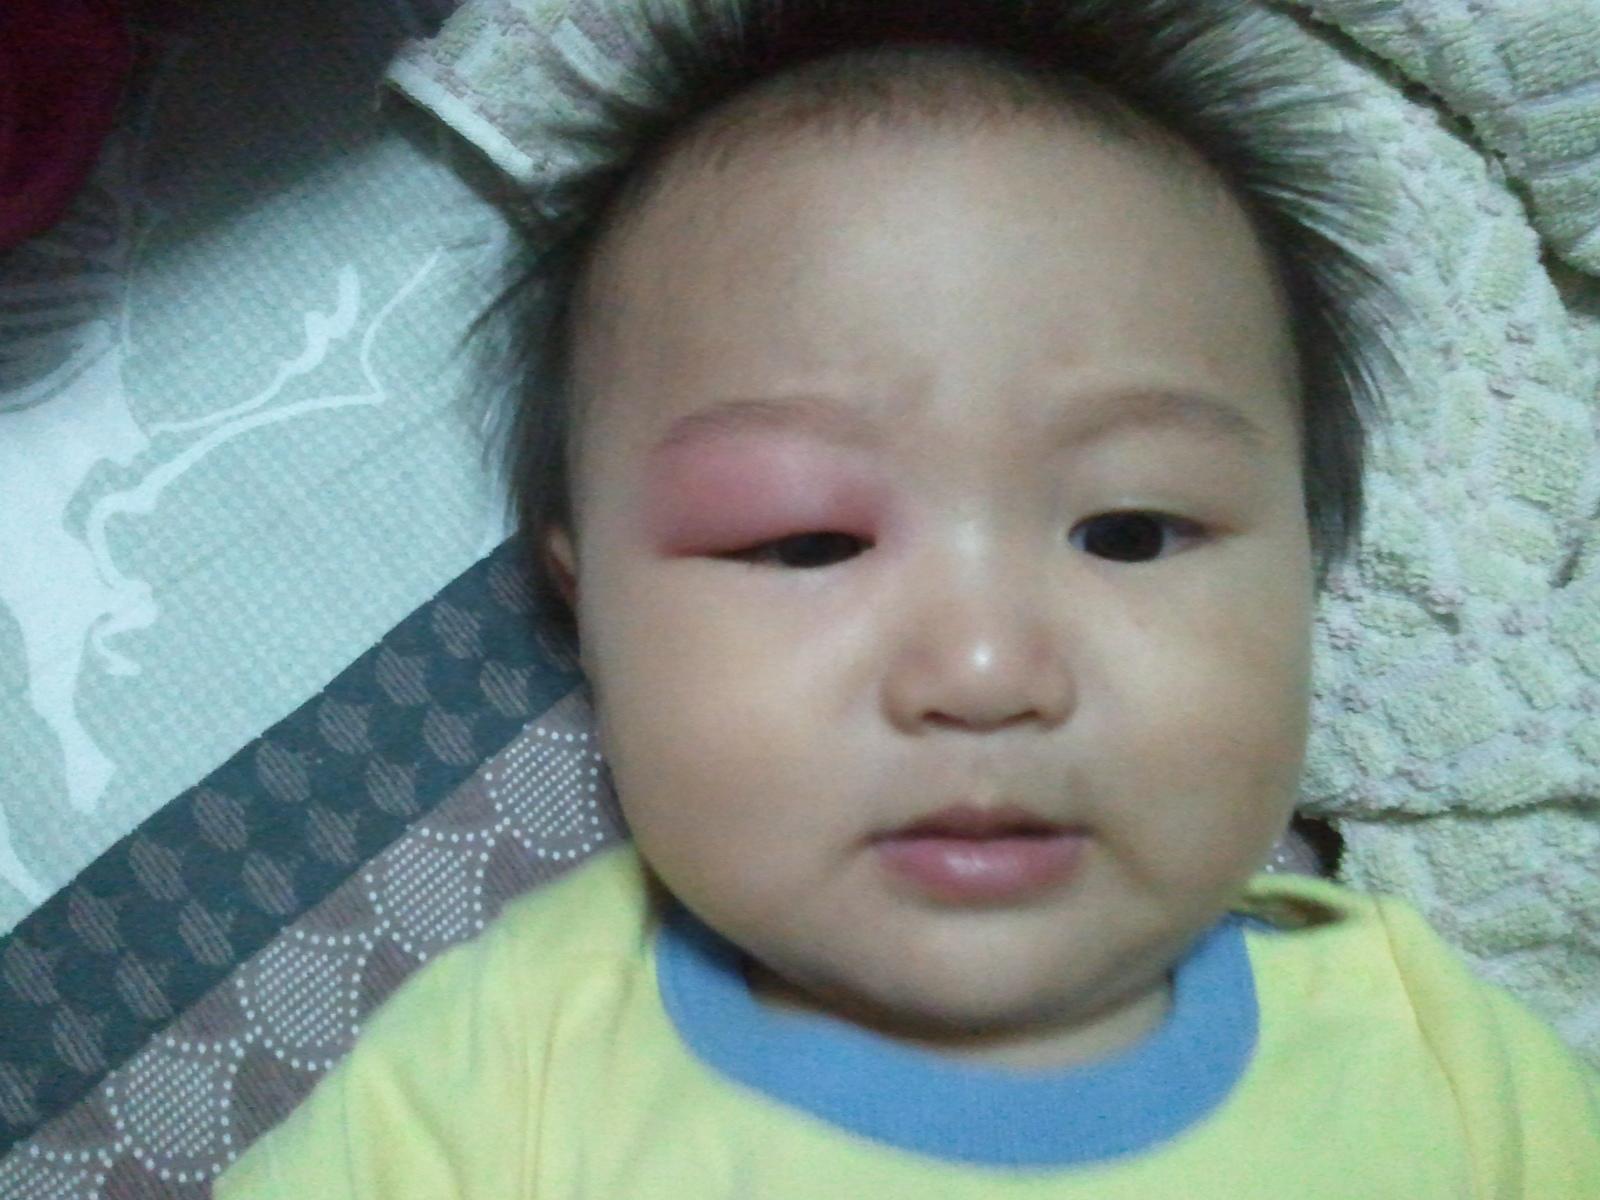 Bug Bites in Babies: Symptoms You Shouldn't Ignore - Flo